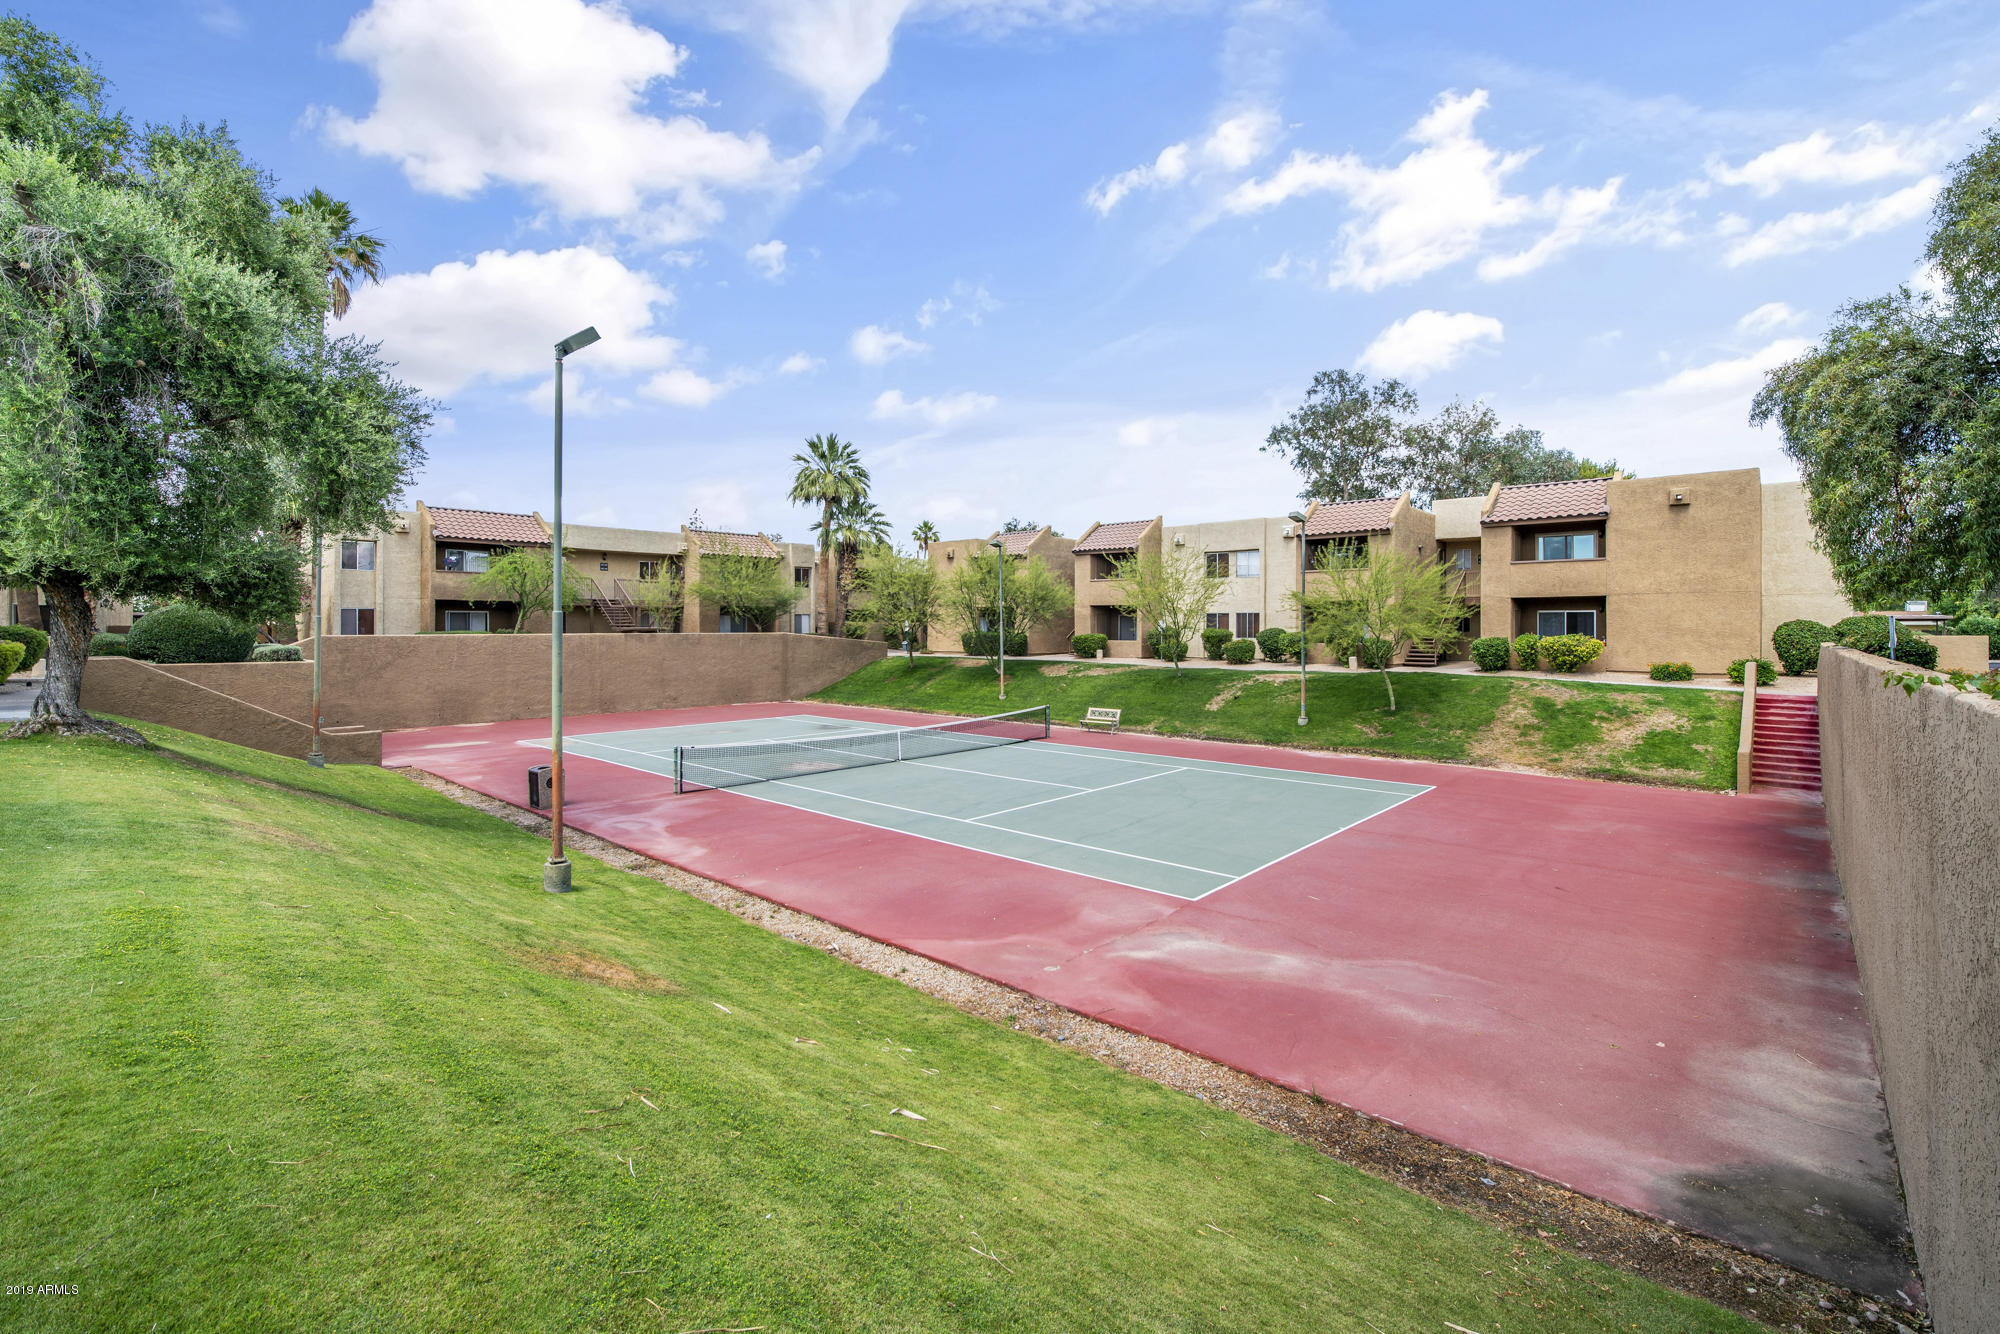 MLS 5934170 5877 N GRANITE REEF Road Unit 2261 Building Buildi, Scottsdale, AZ 85250 Scottsdale AZ Monterra